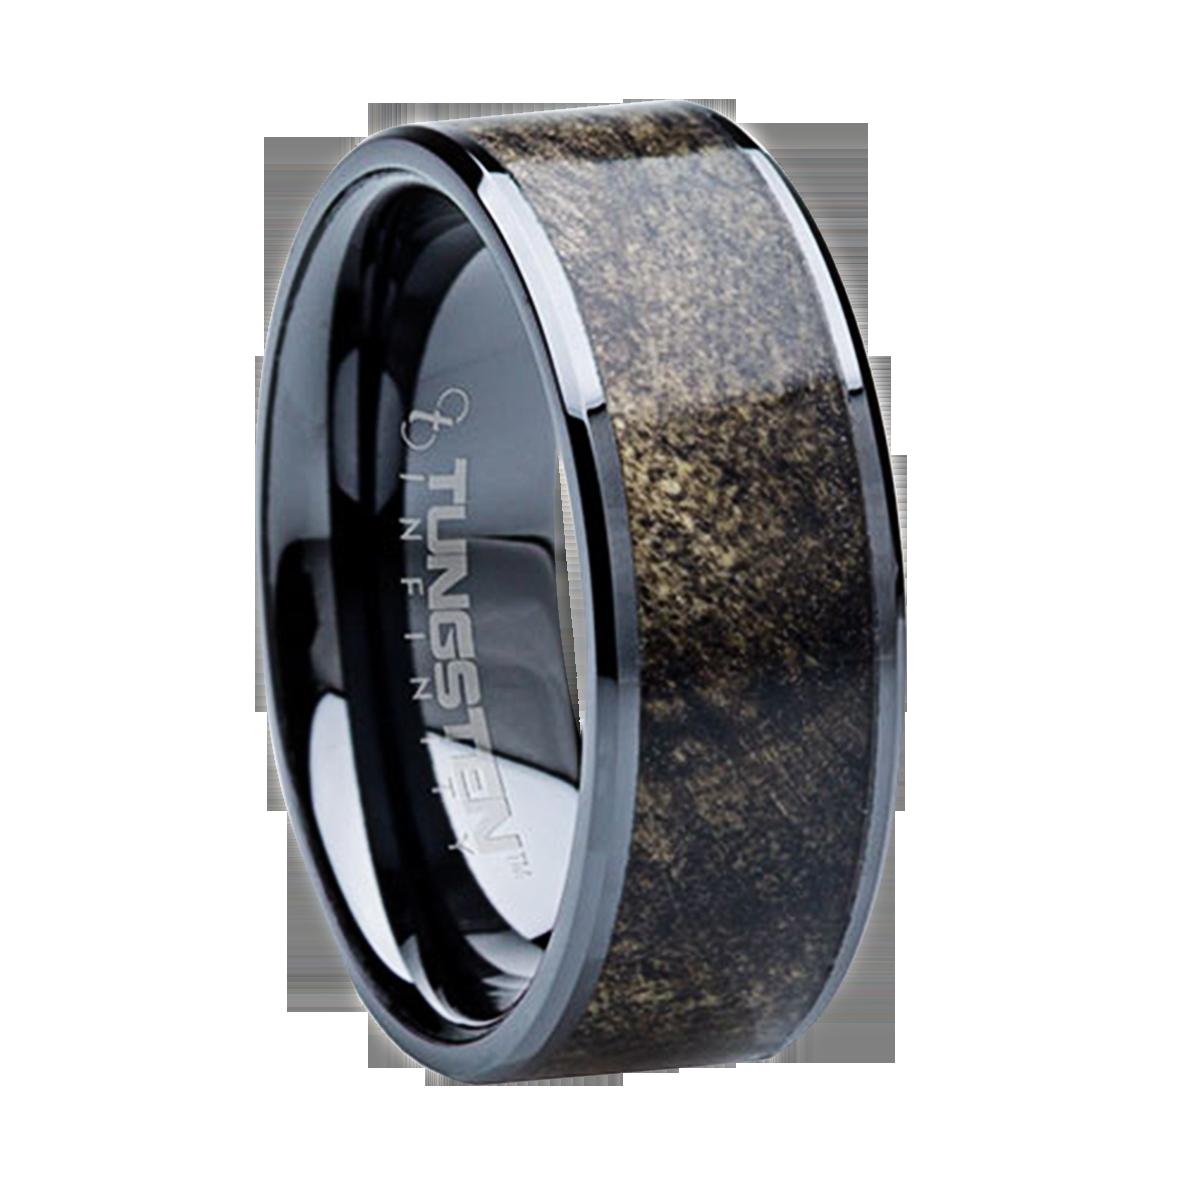 Mens Wedding Bands   8 Mm Tungsten Carbide With Buckeye Wood Inlay   B115M,  $599.99